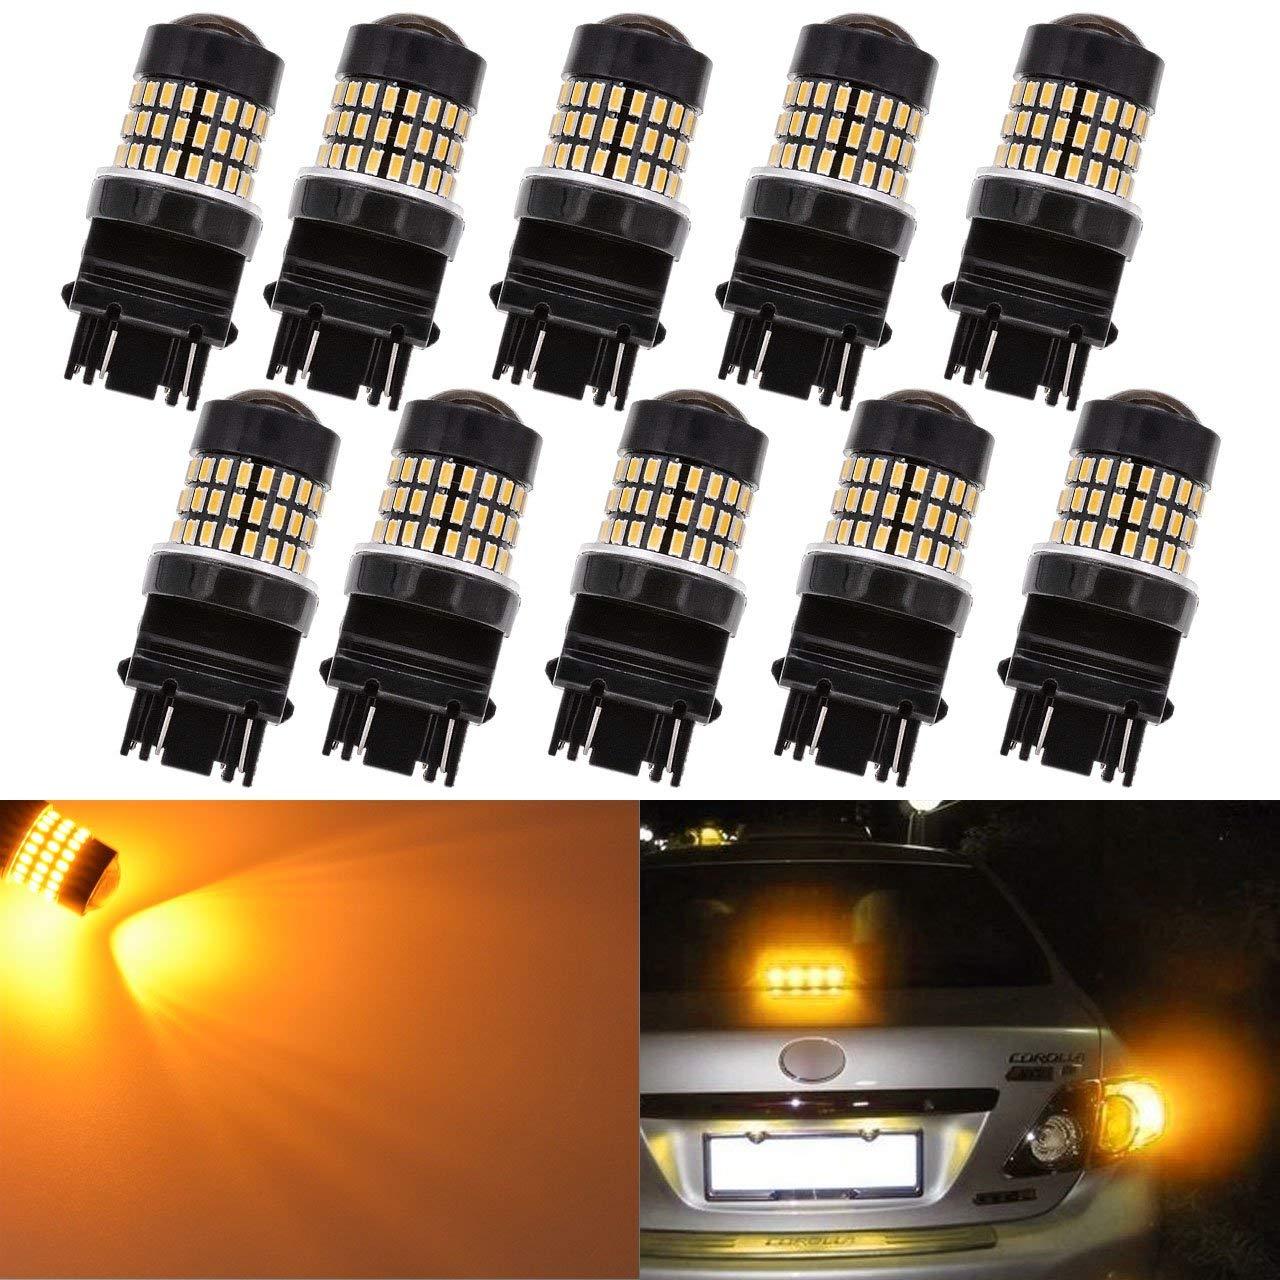 2pcs x 3157 Amber Parking Light 24 LED Light Bulbs 4157NA 3057A 3357-1 Pair